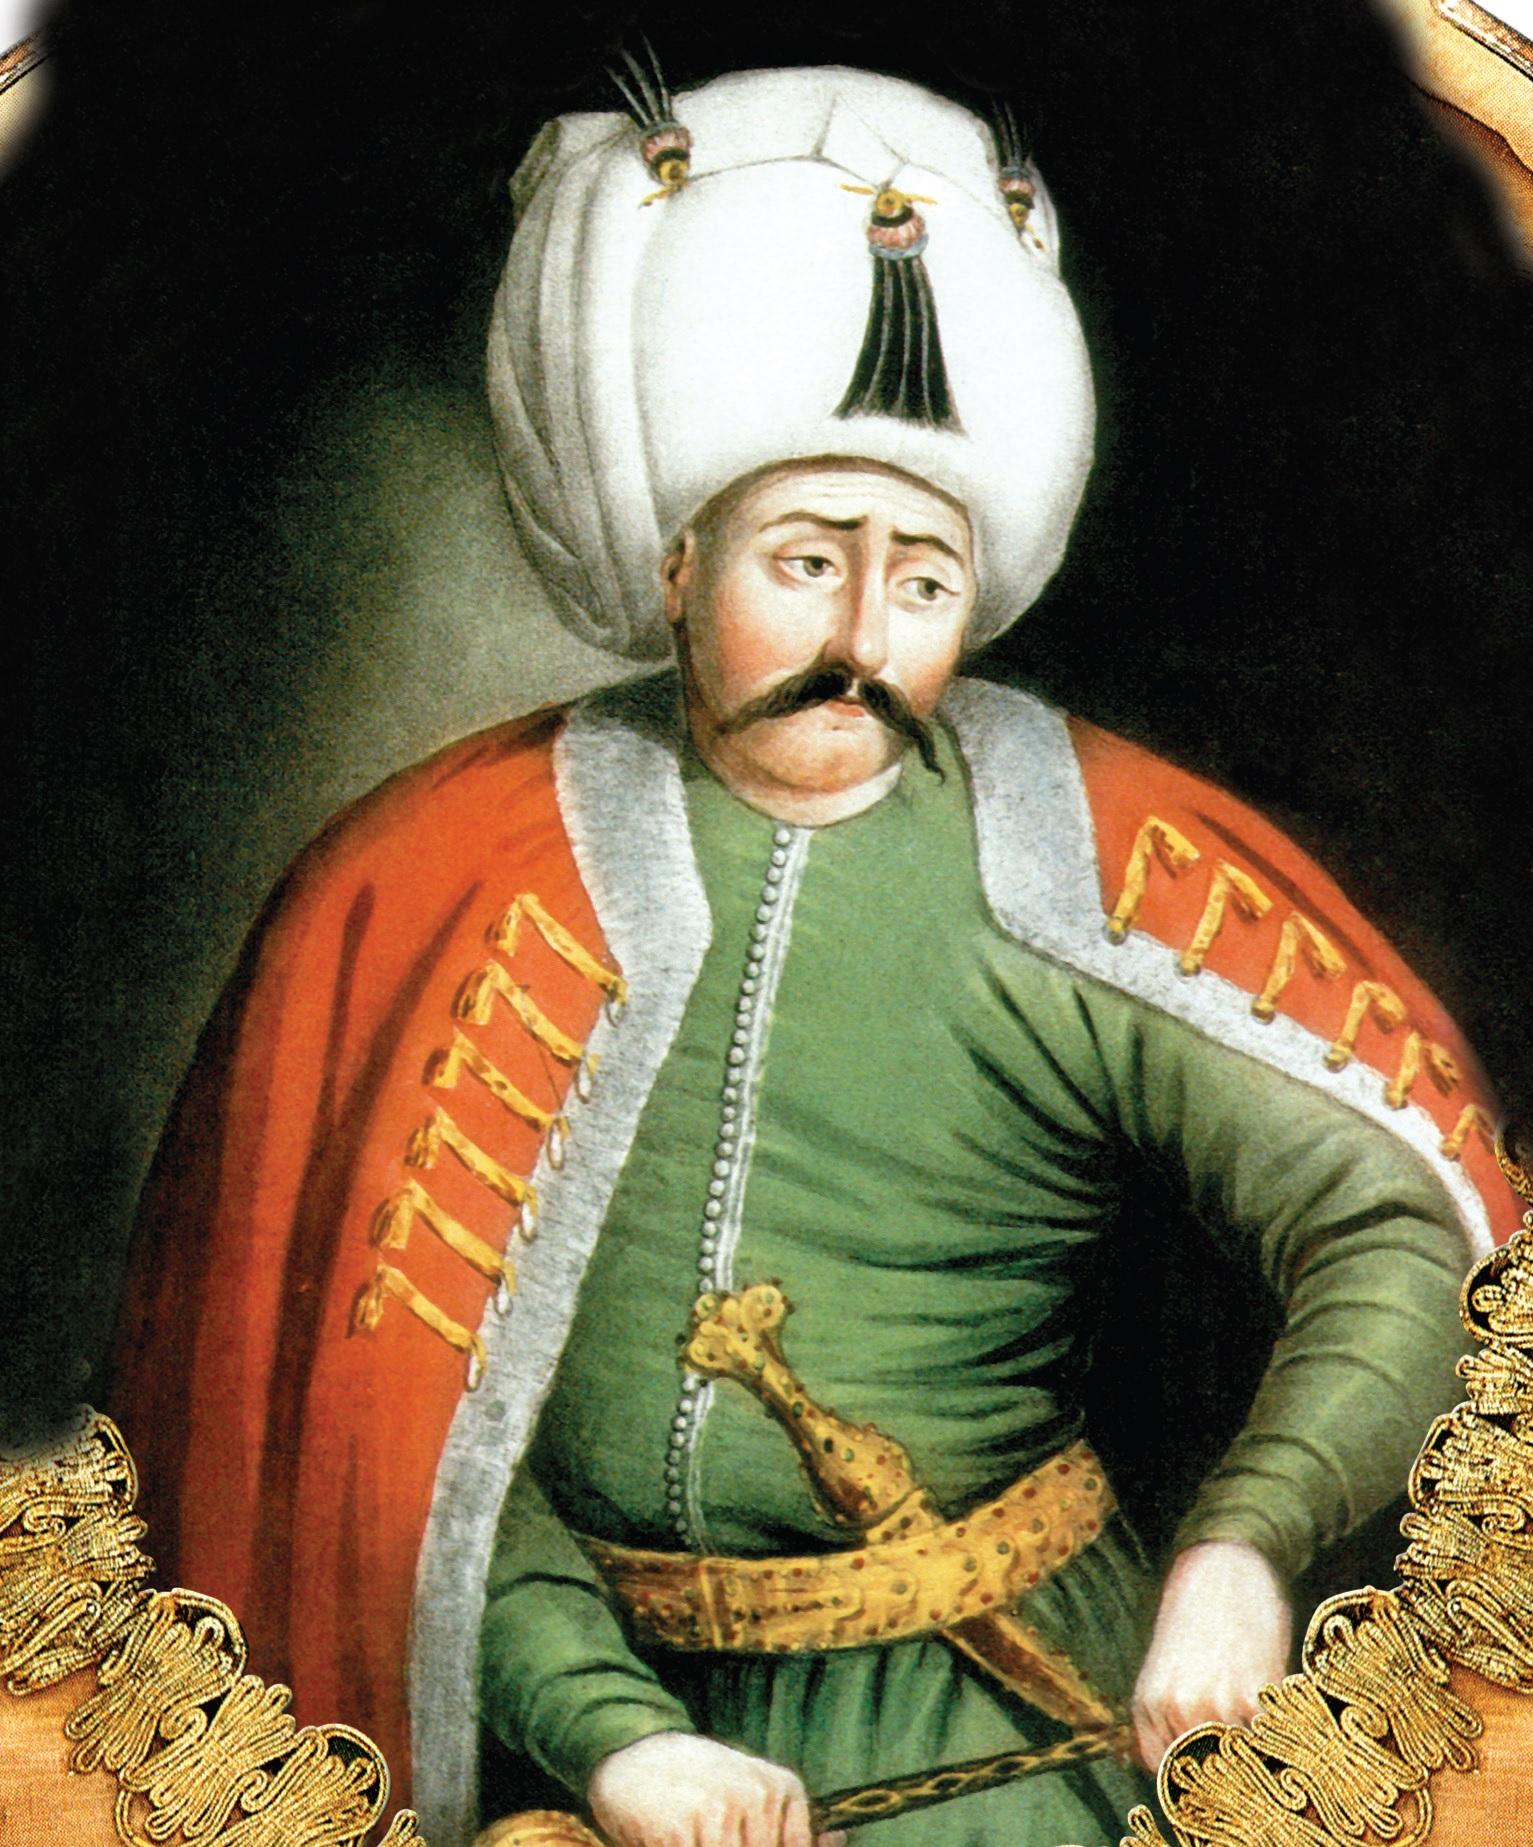 Sp Sp Osmanli 1451 V0 4 Cikti Taleworlds Forums